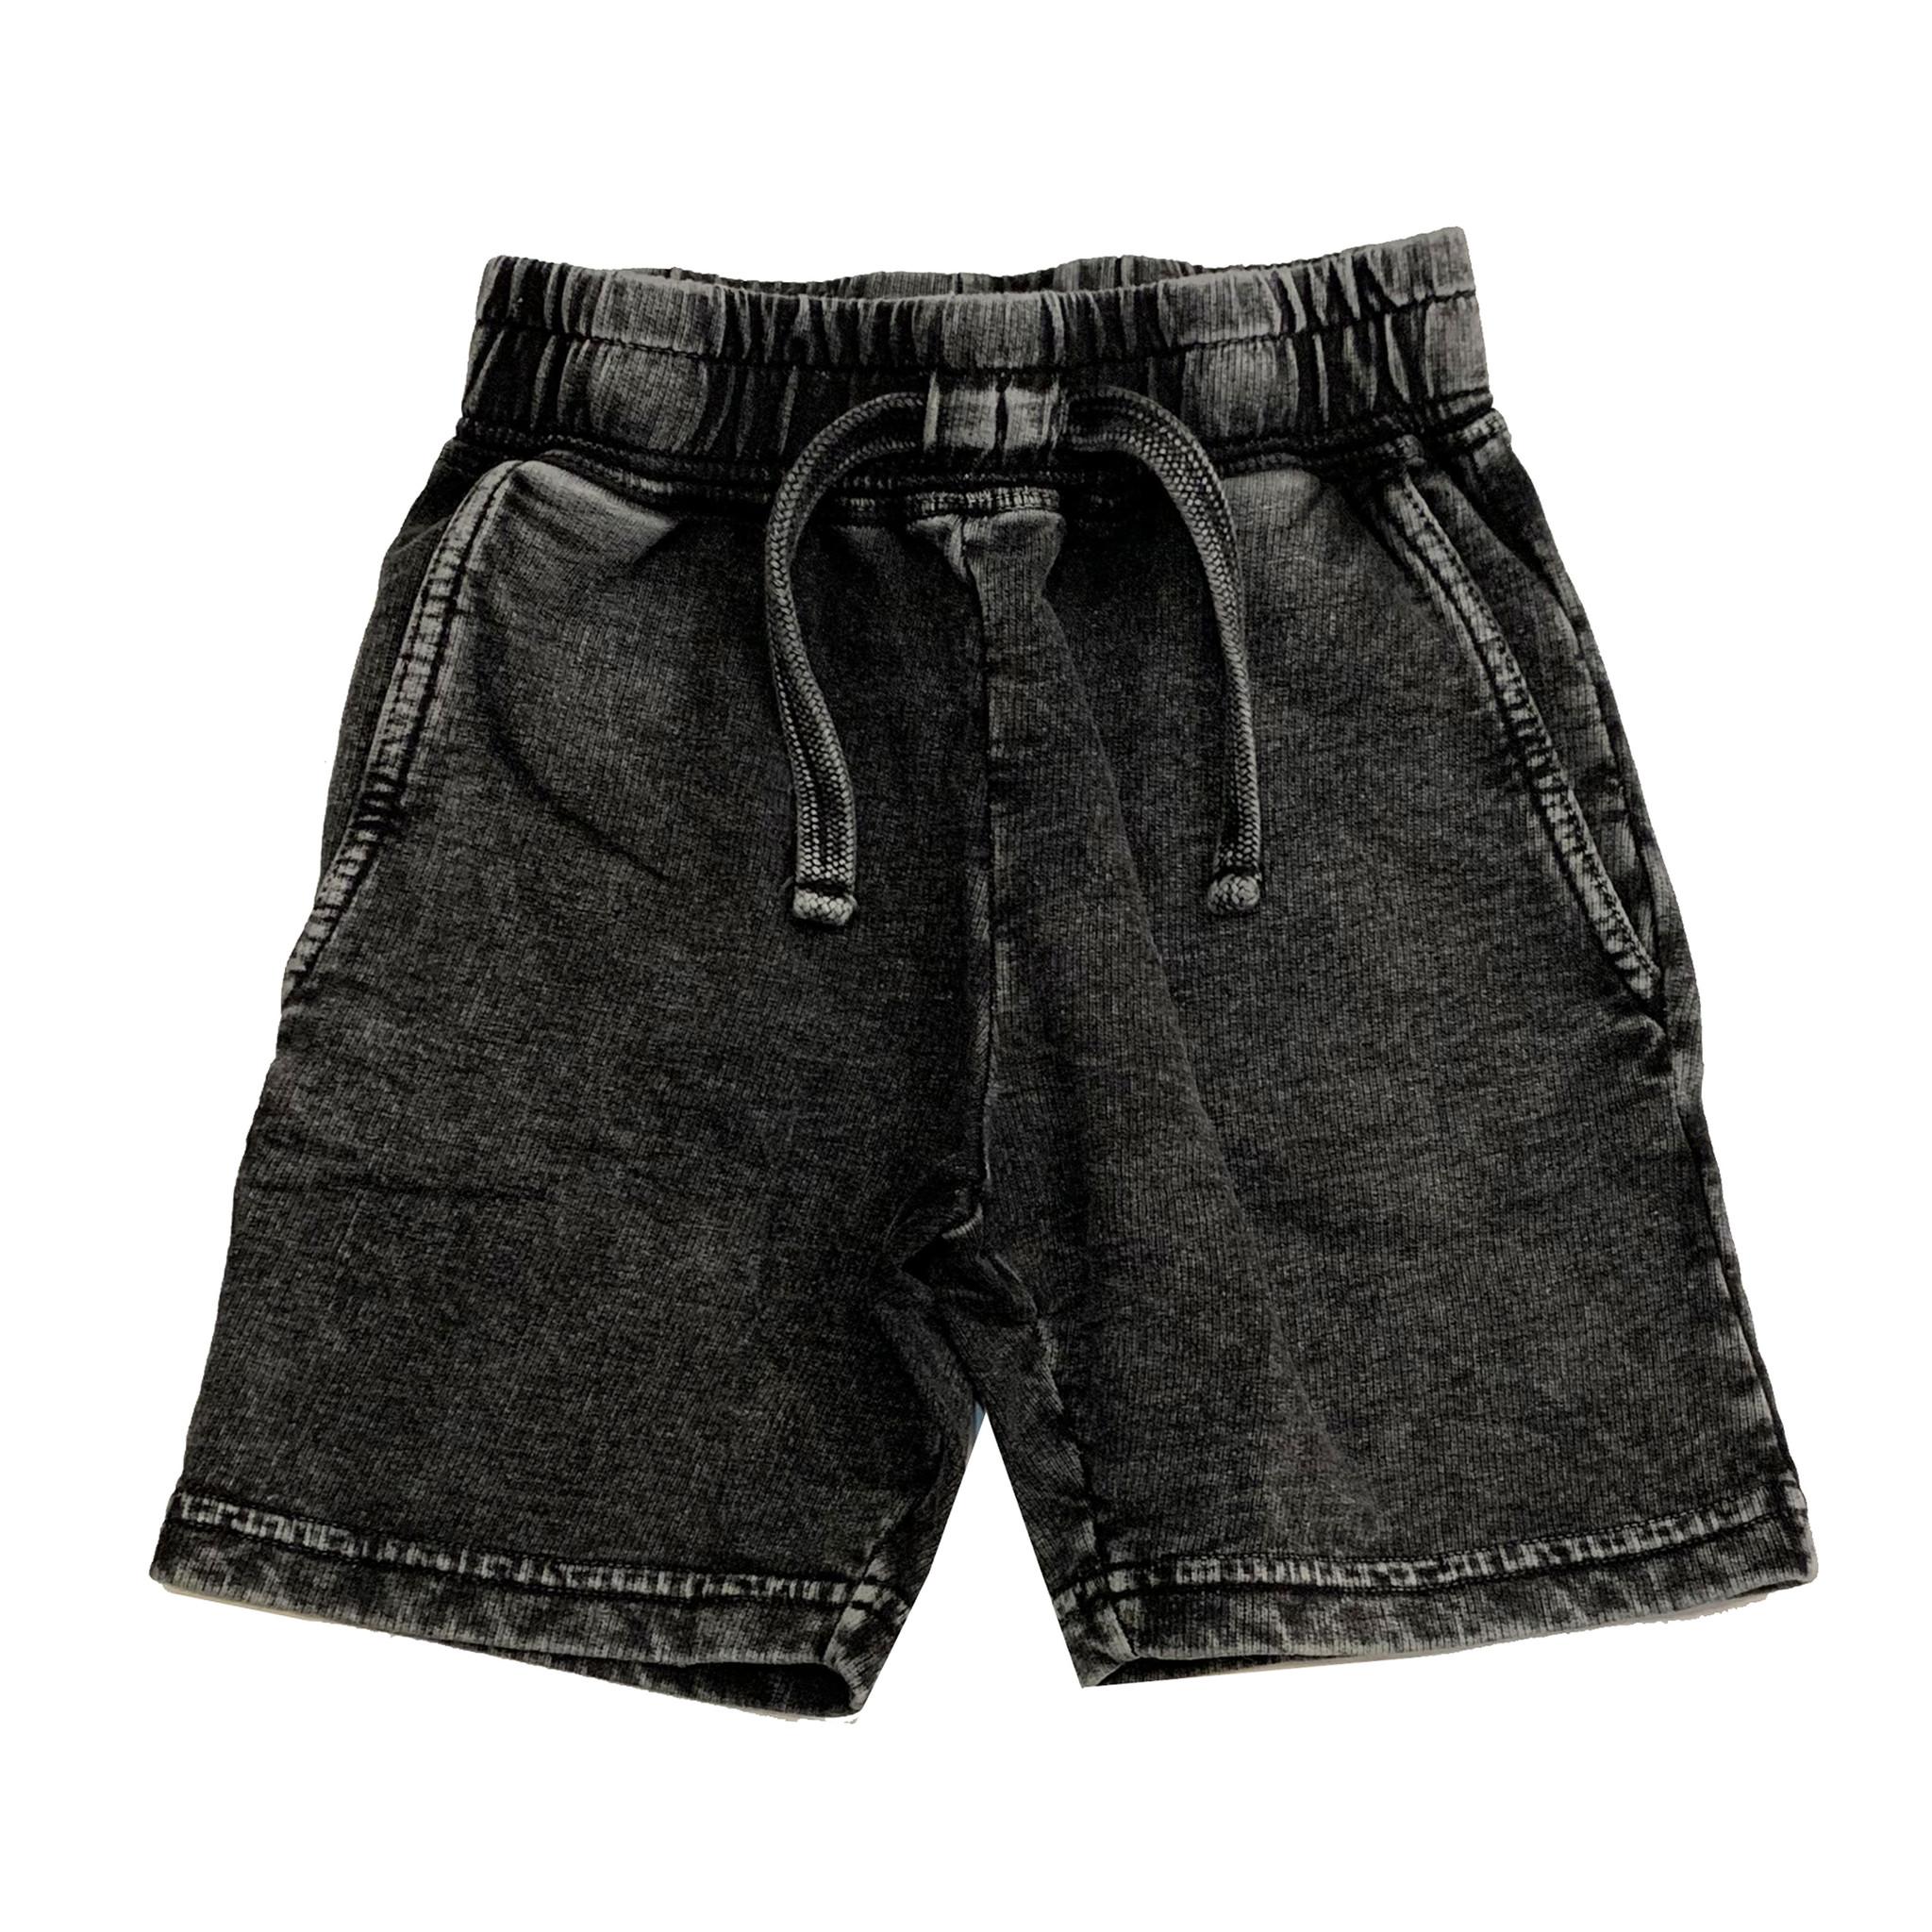 Mish Black Enzyme Shorts